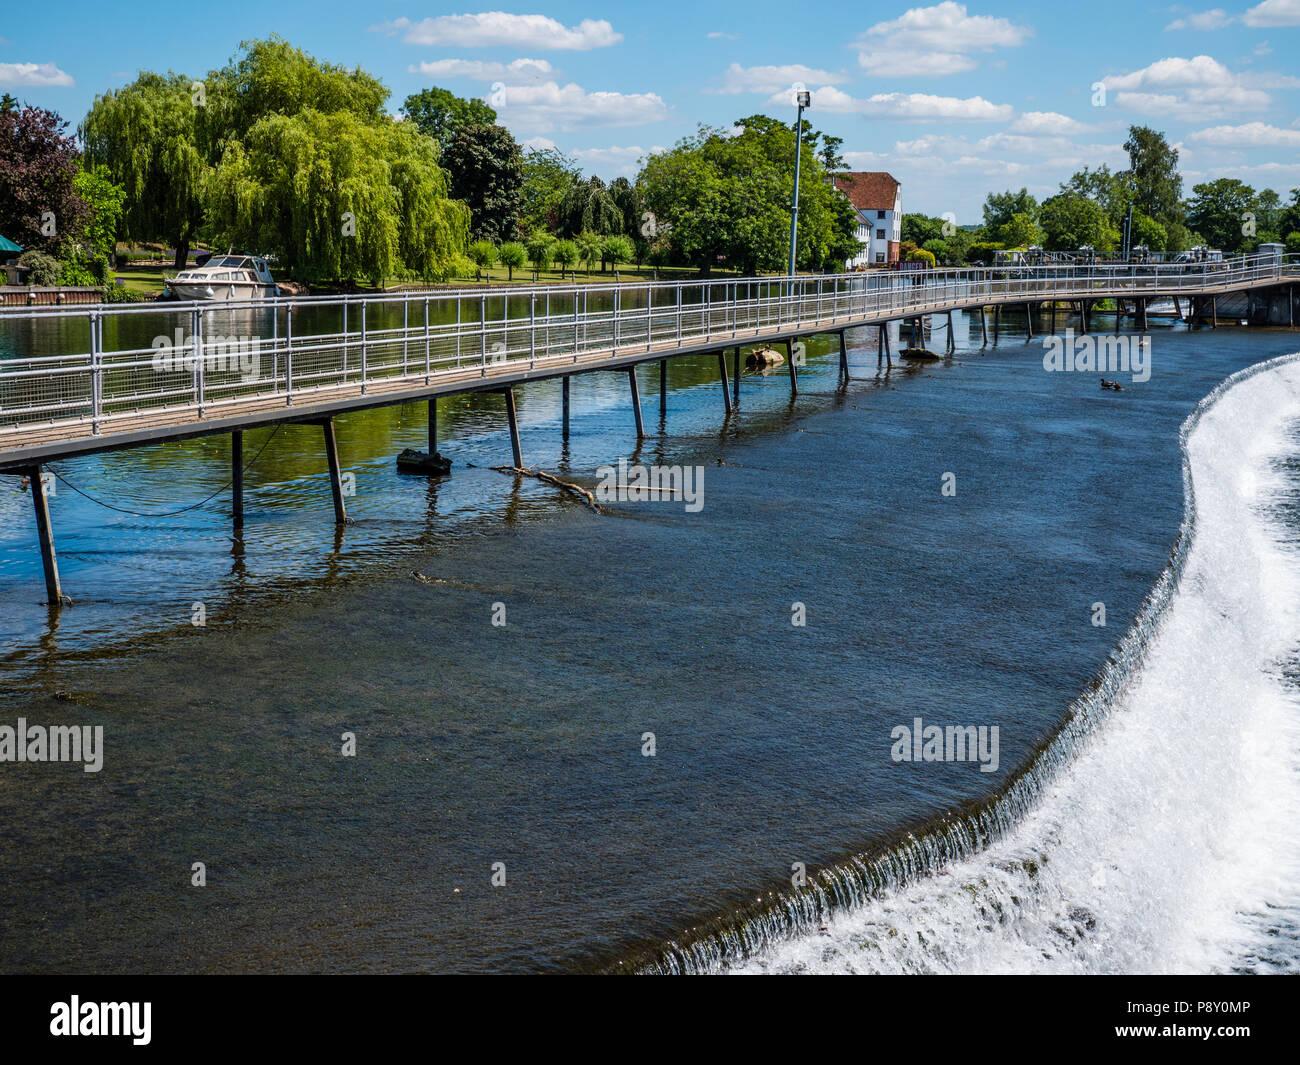 Walkway on Wier, Hambleden Lock and Weir, River Thames, Berkshire, England, UK, GB. - Stock Image